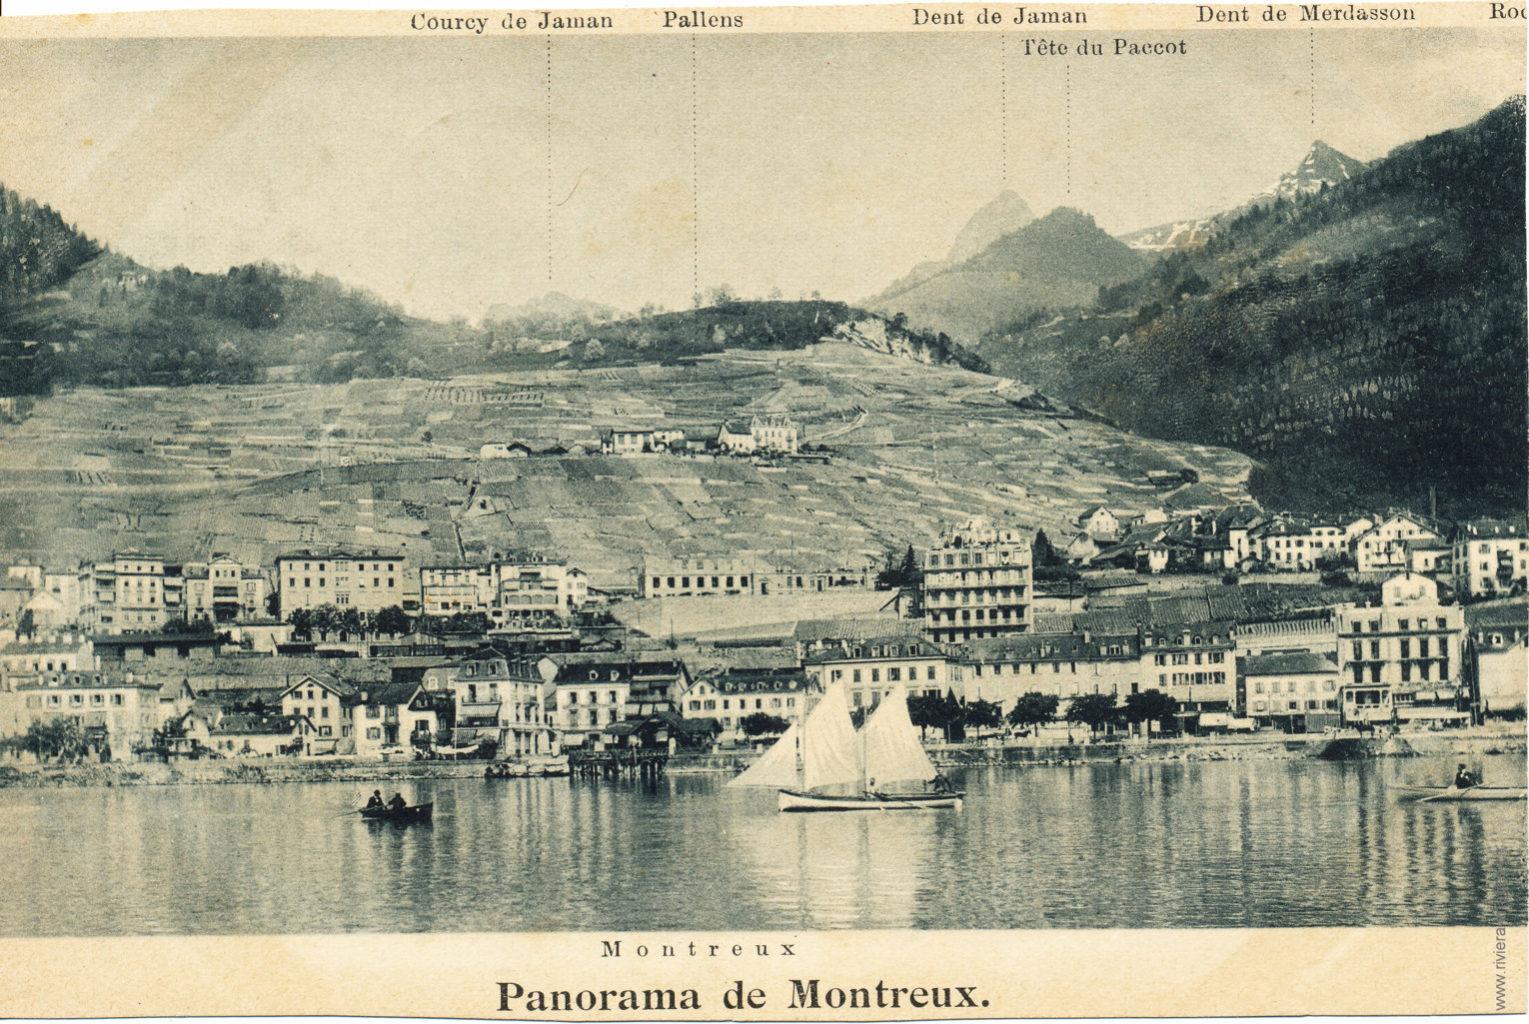 Panorama de Montreux